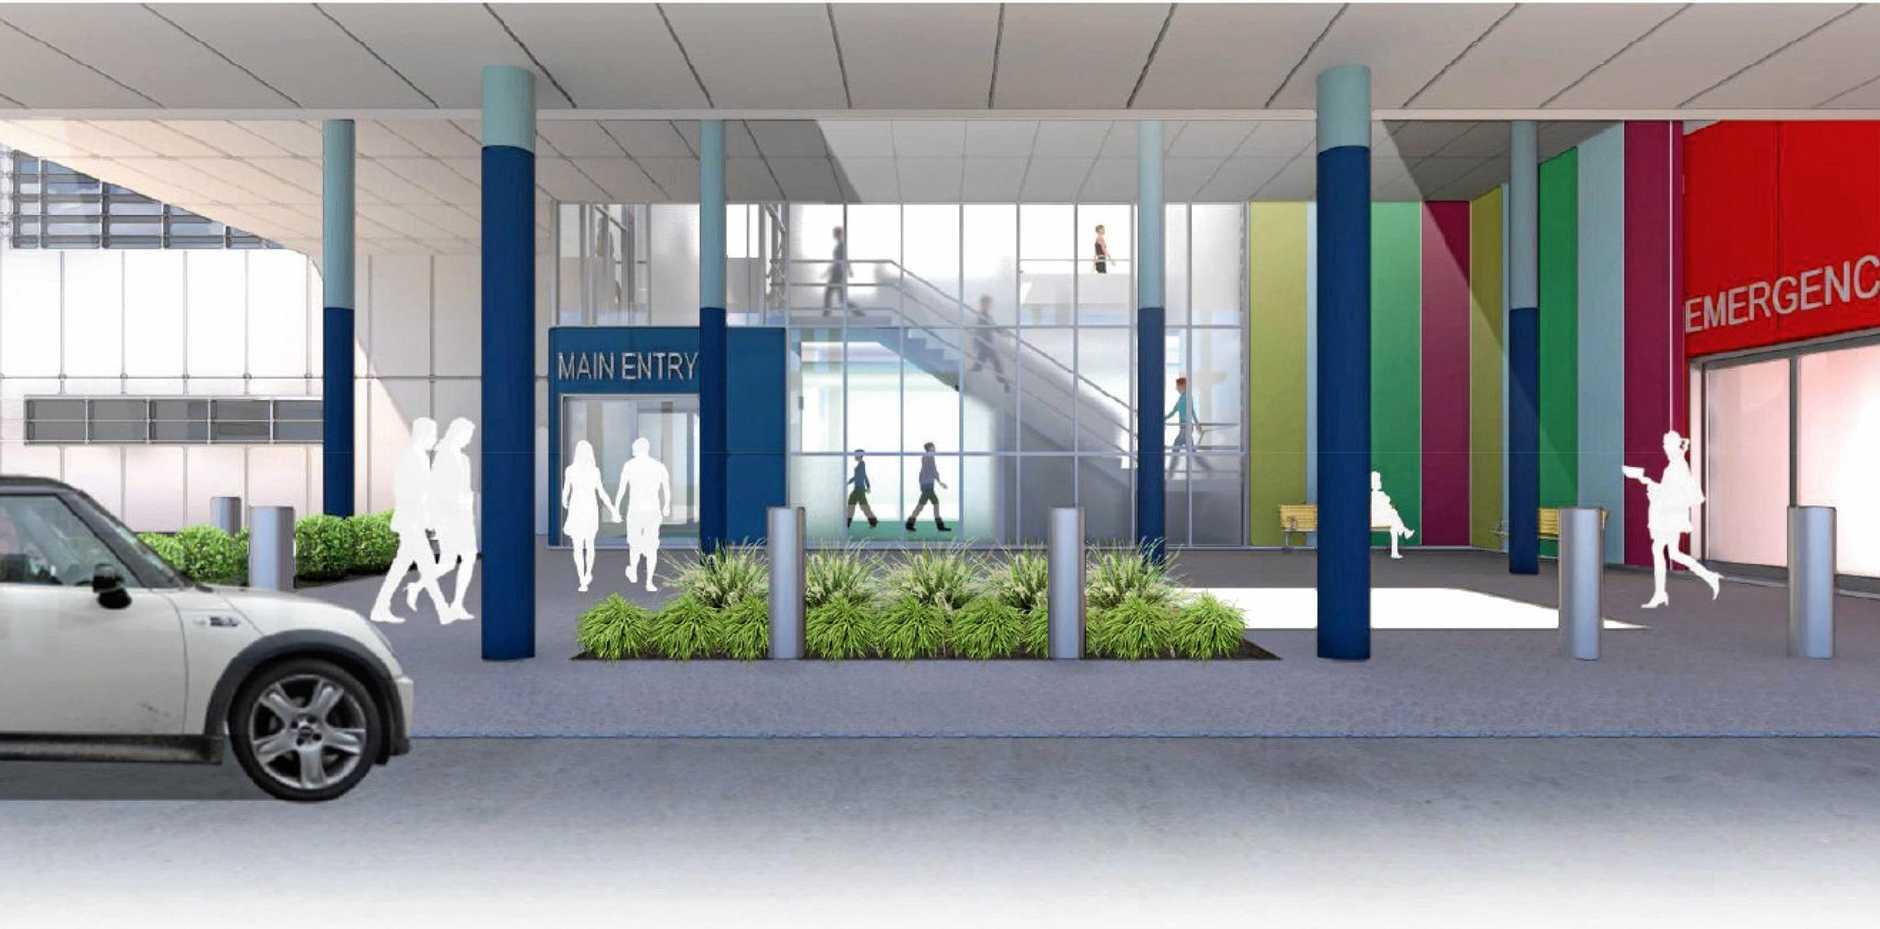 PROGRESS: An artist's impression of the $42 million Gladstone Hospital Emergency Department upgrade.